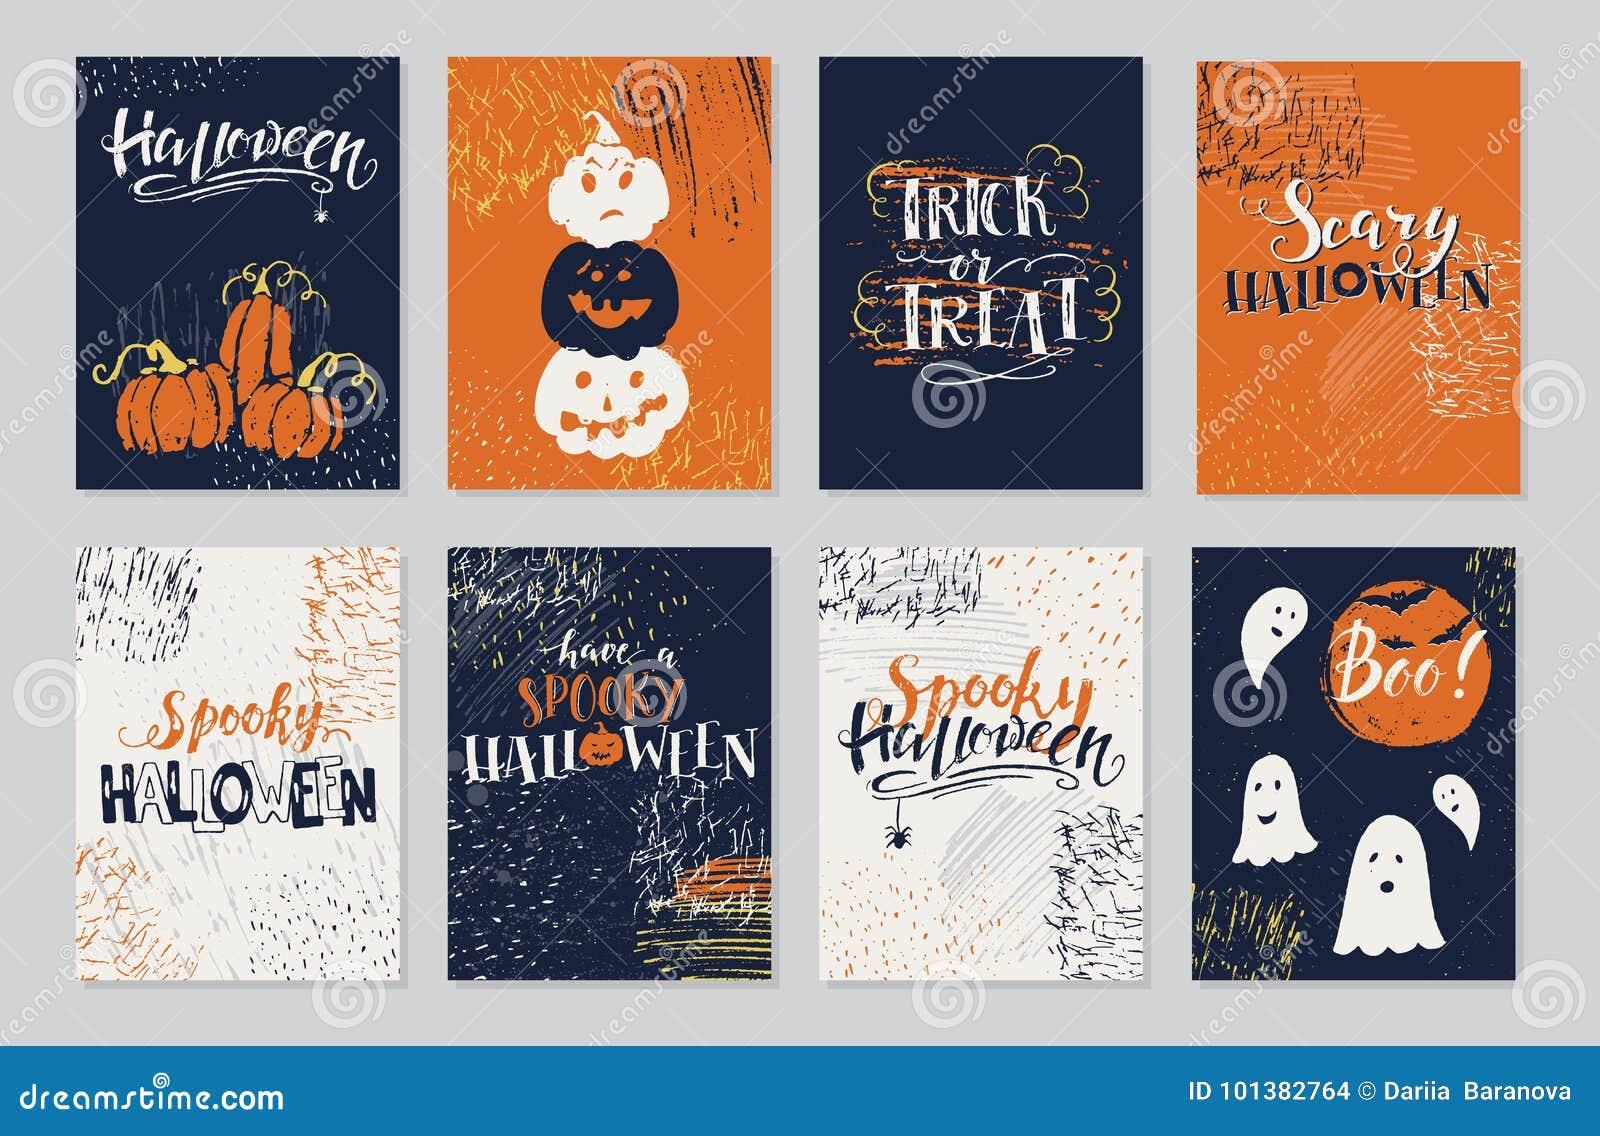 halloween cards set stock vector illustration of horror 101382764